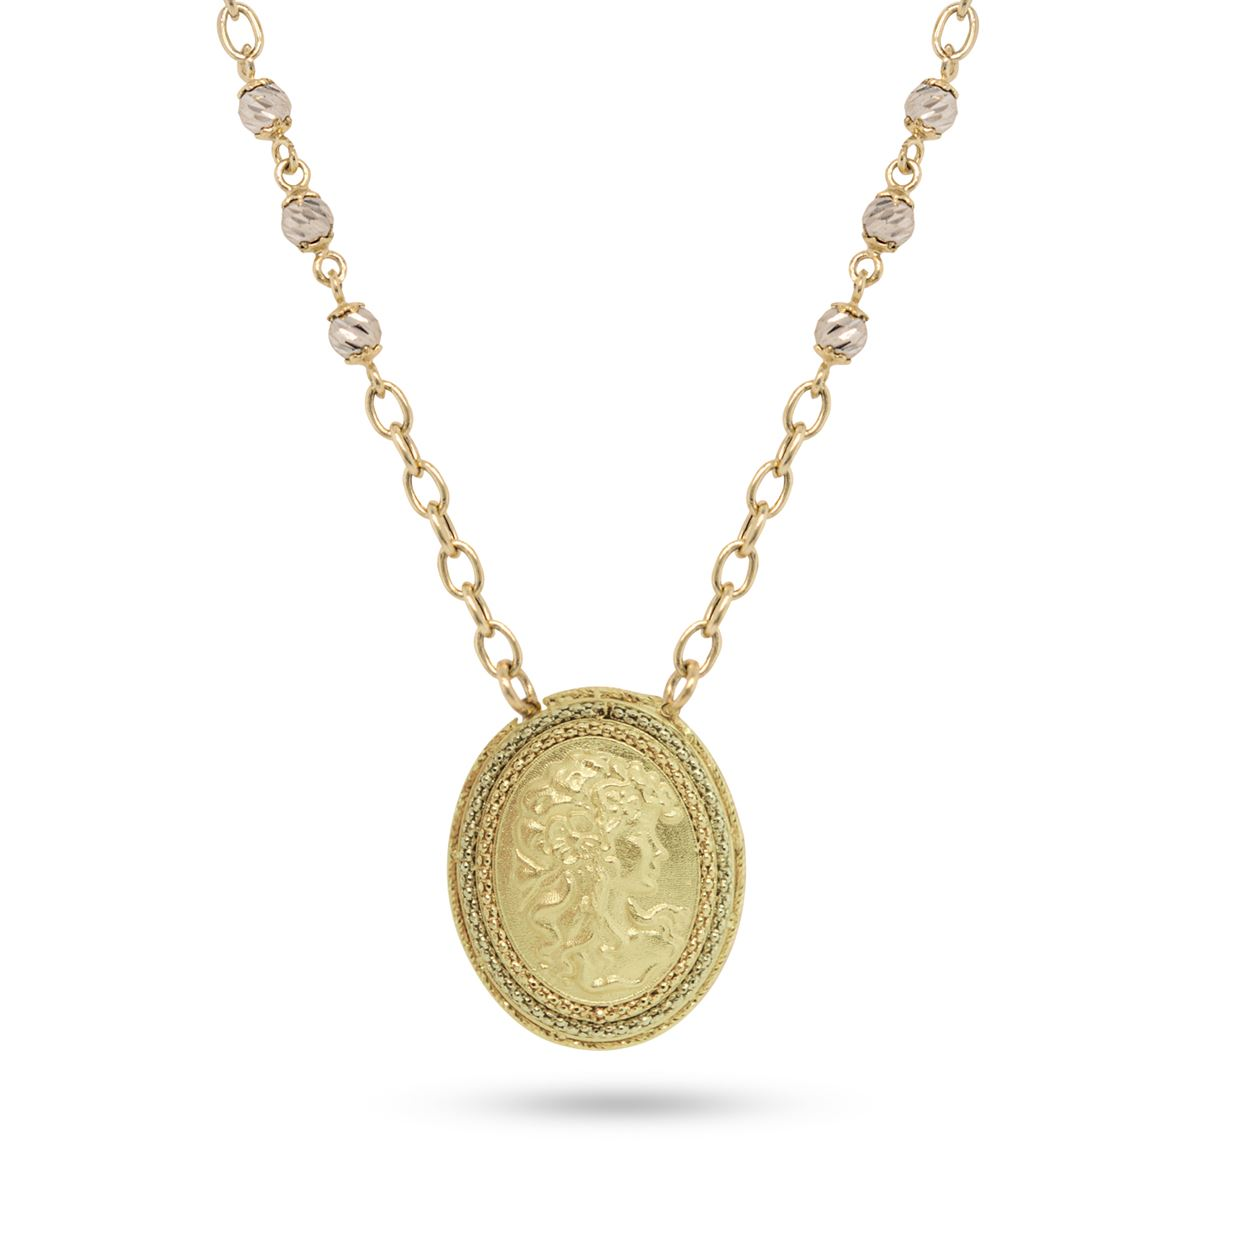 Antik Altın Kolye ABKL202111